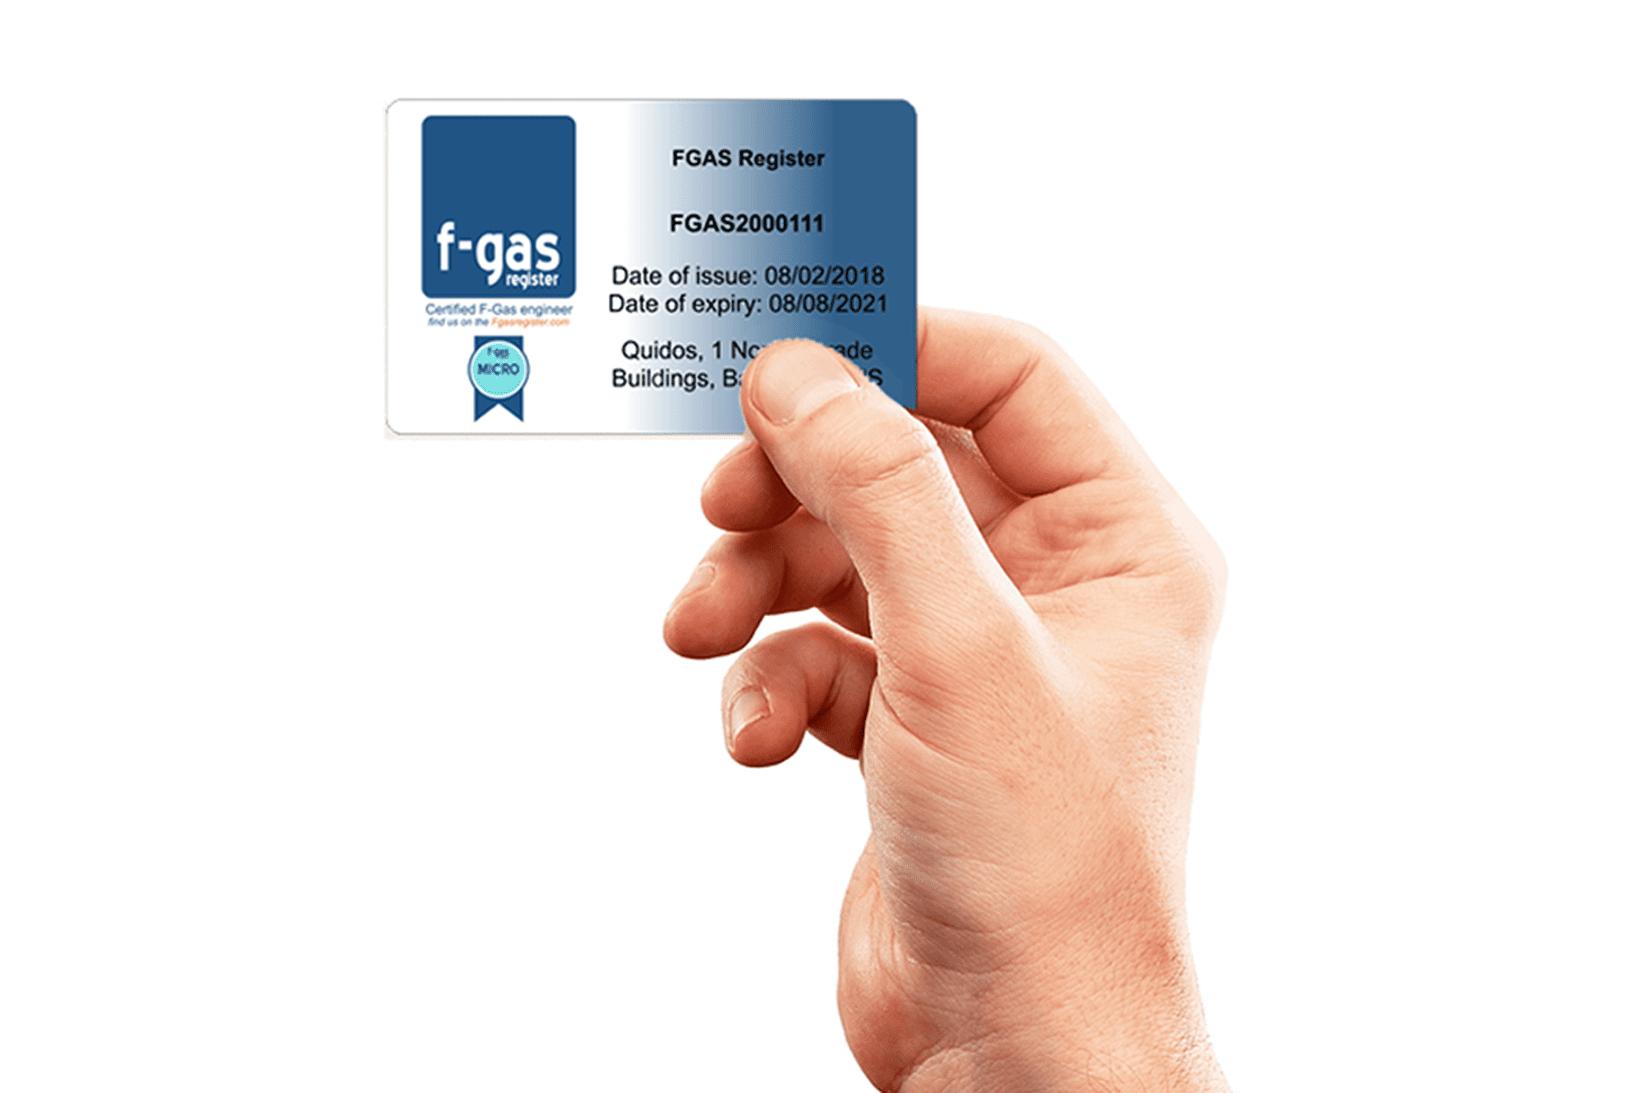 f-gas card hand